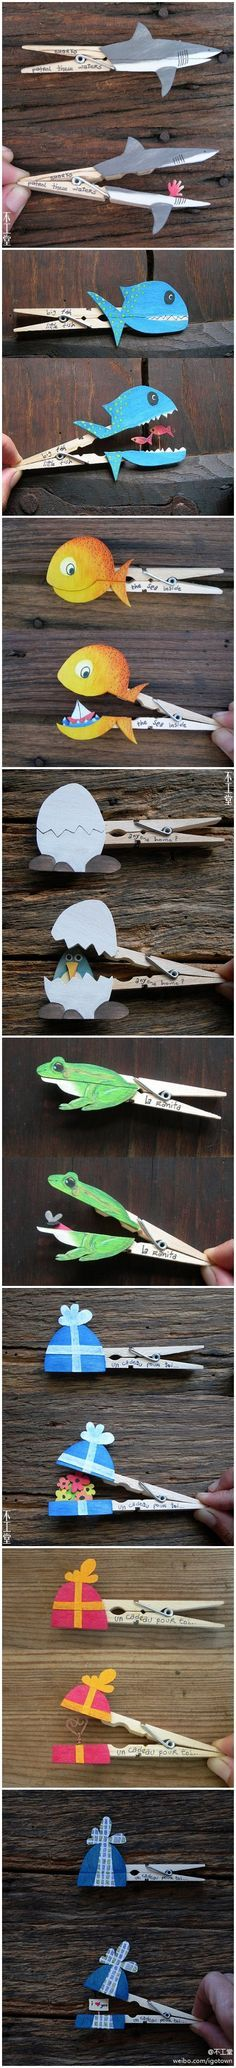 Homemade Creativity ¡Incredible!   Creatividad de andar por casa pero genial!!